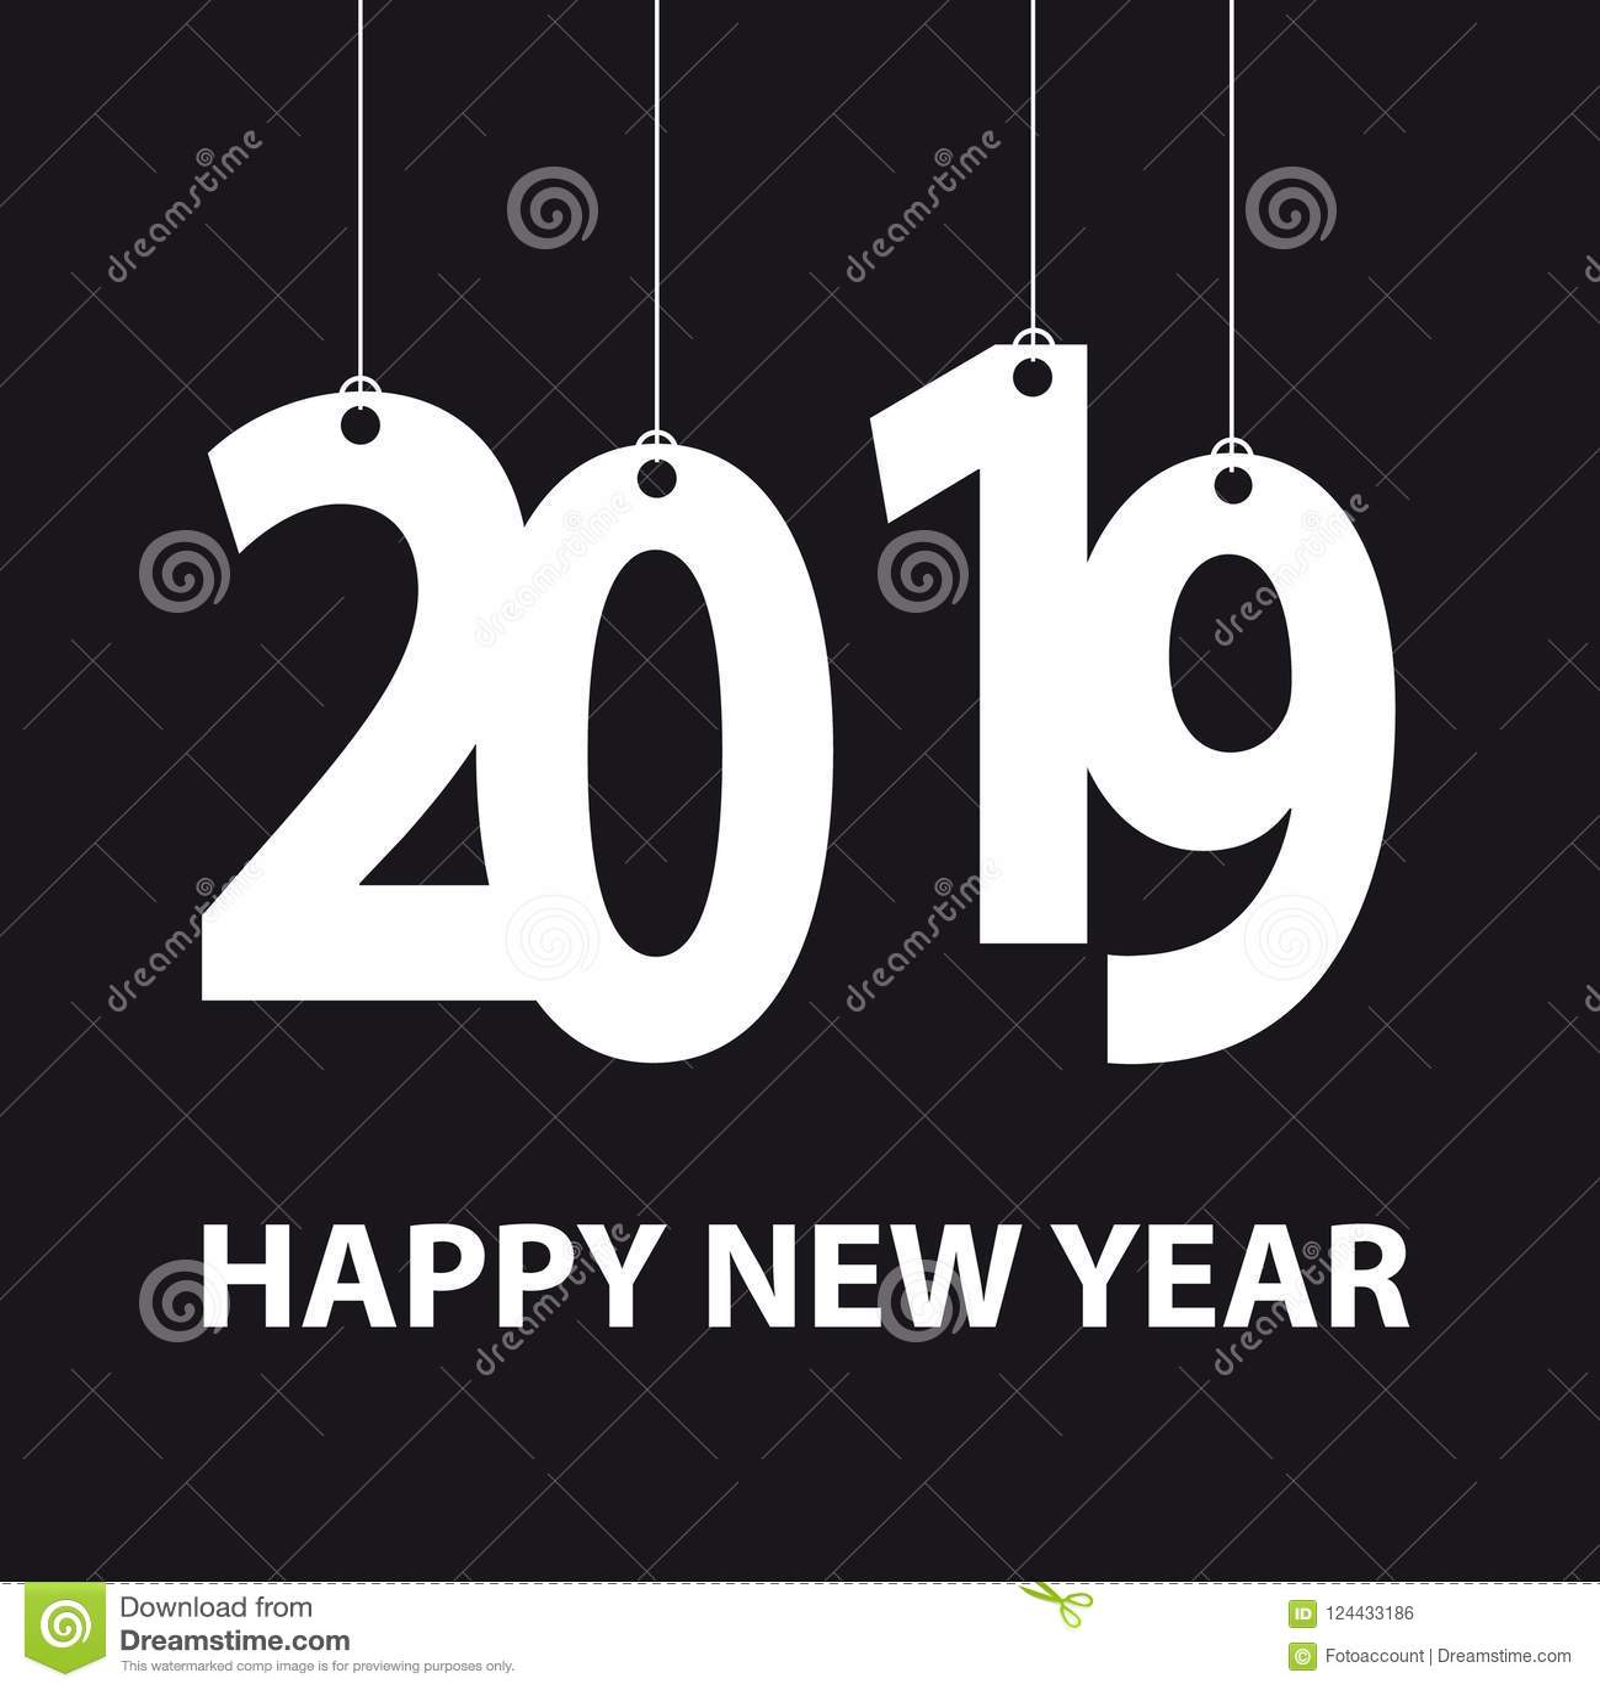 hanging happy new year 2019 background white vector illustration isolated on black background